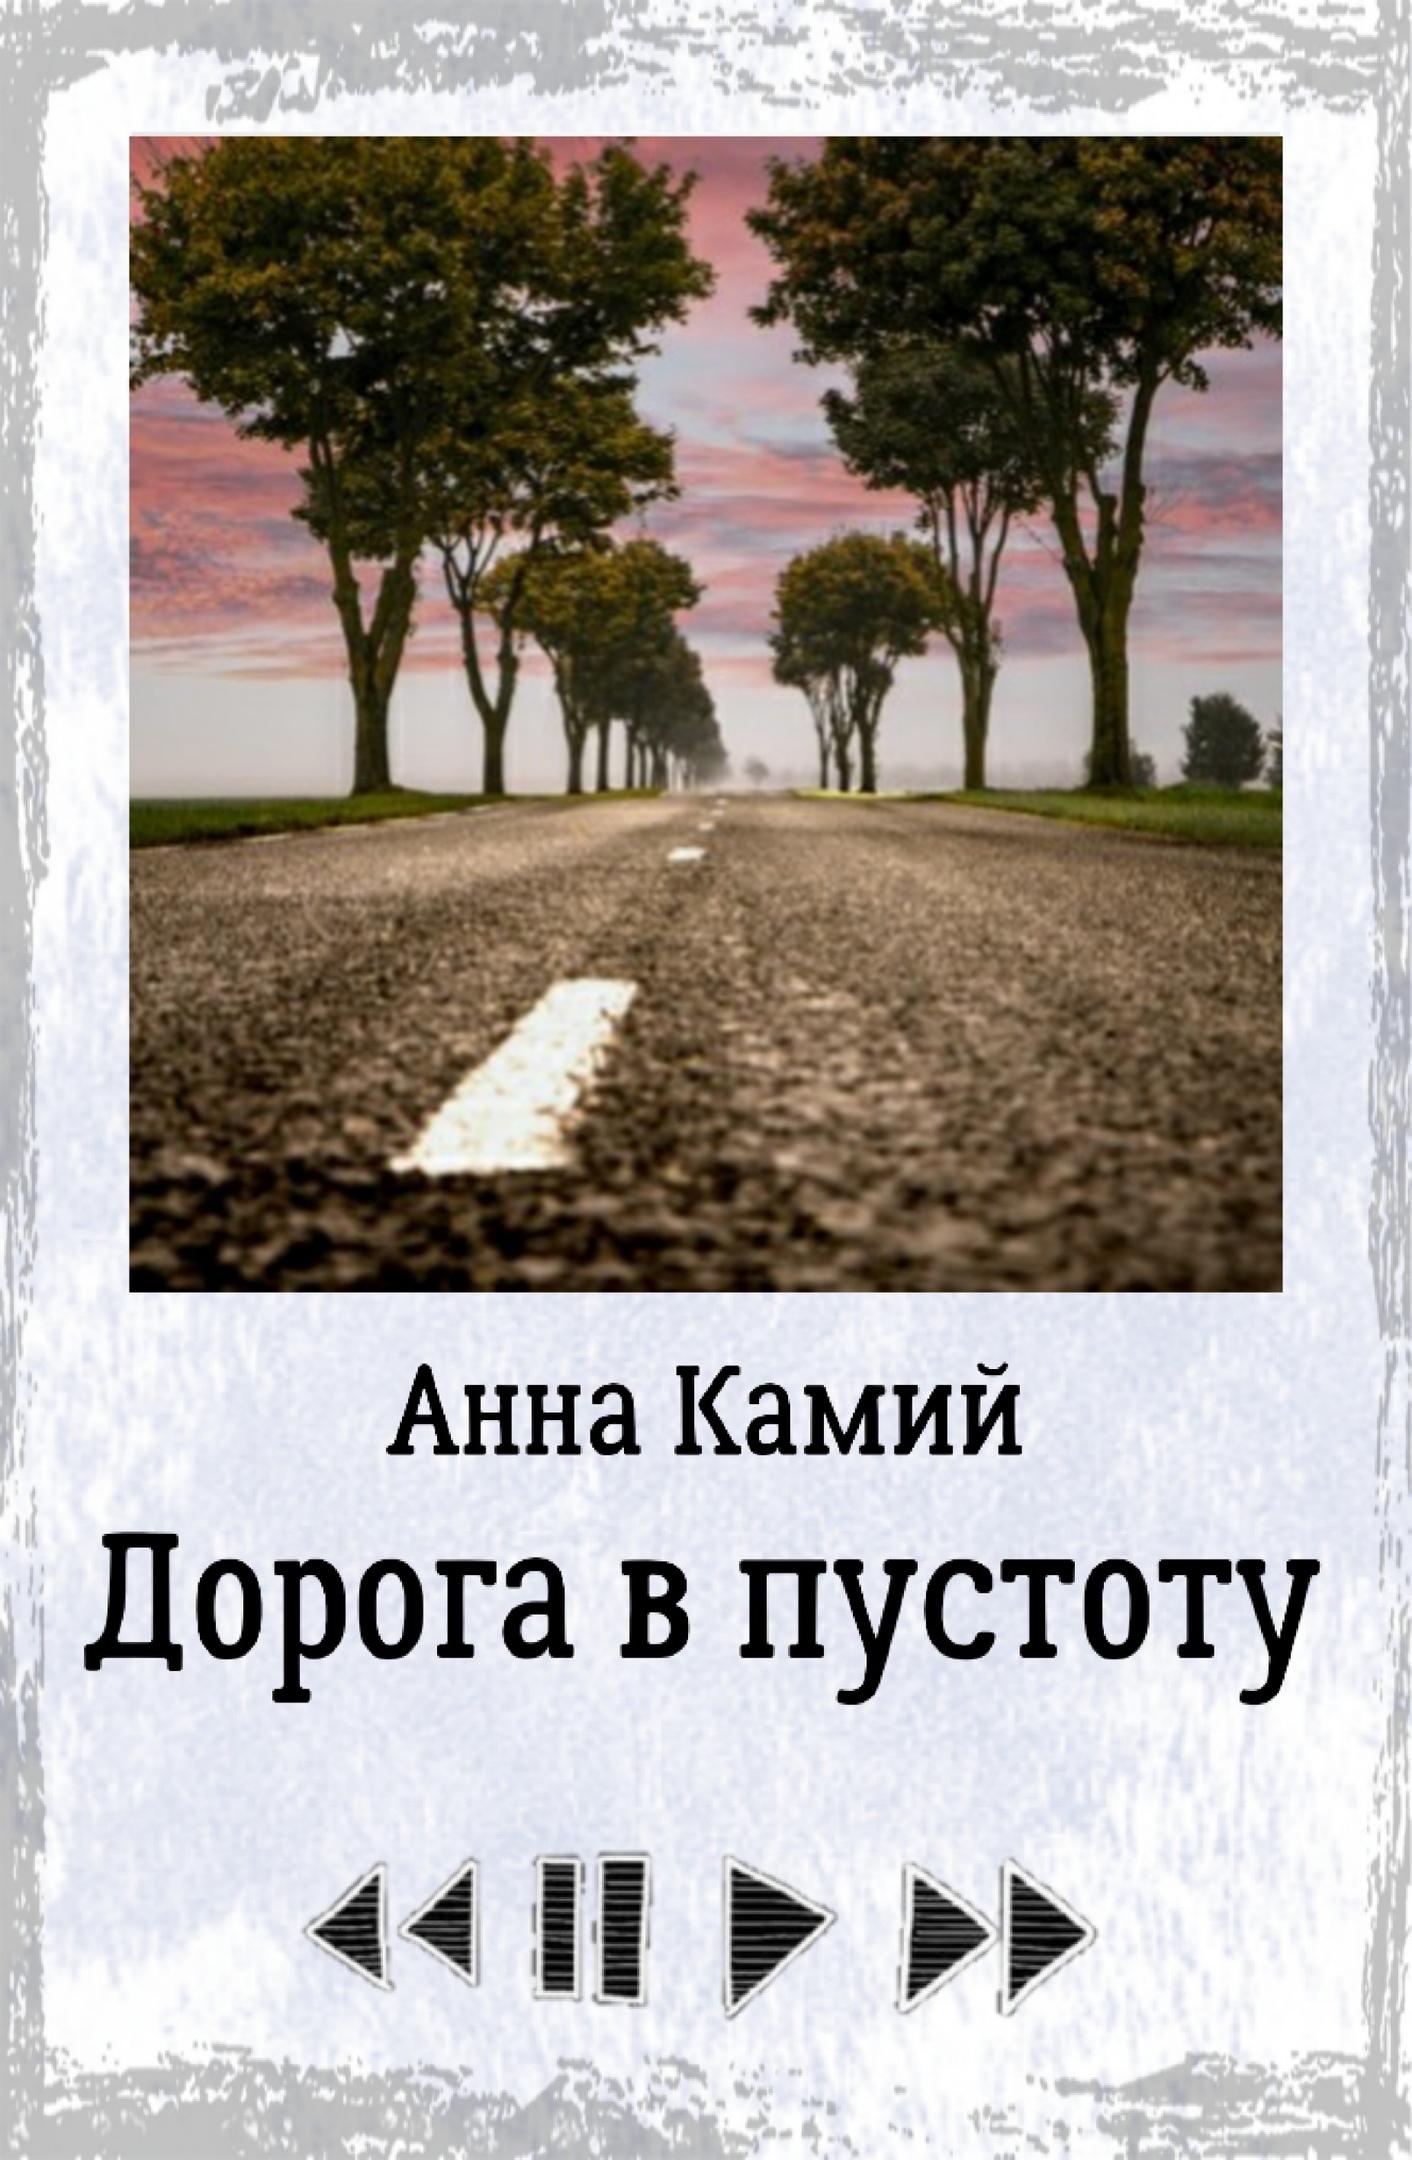 Дорога в пустоту